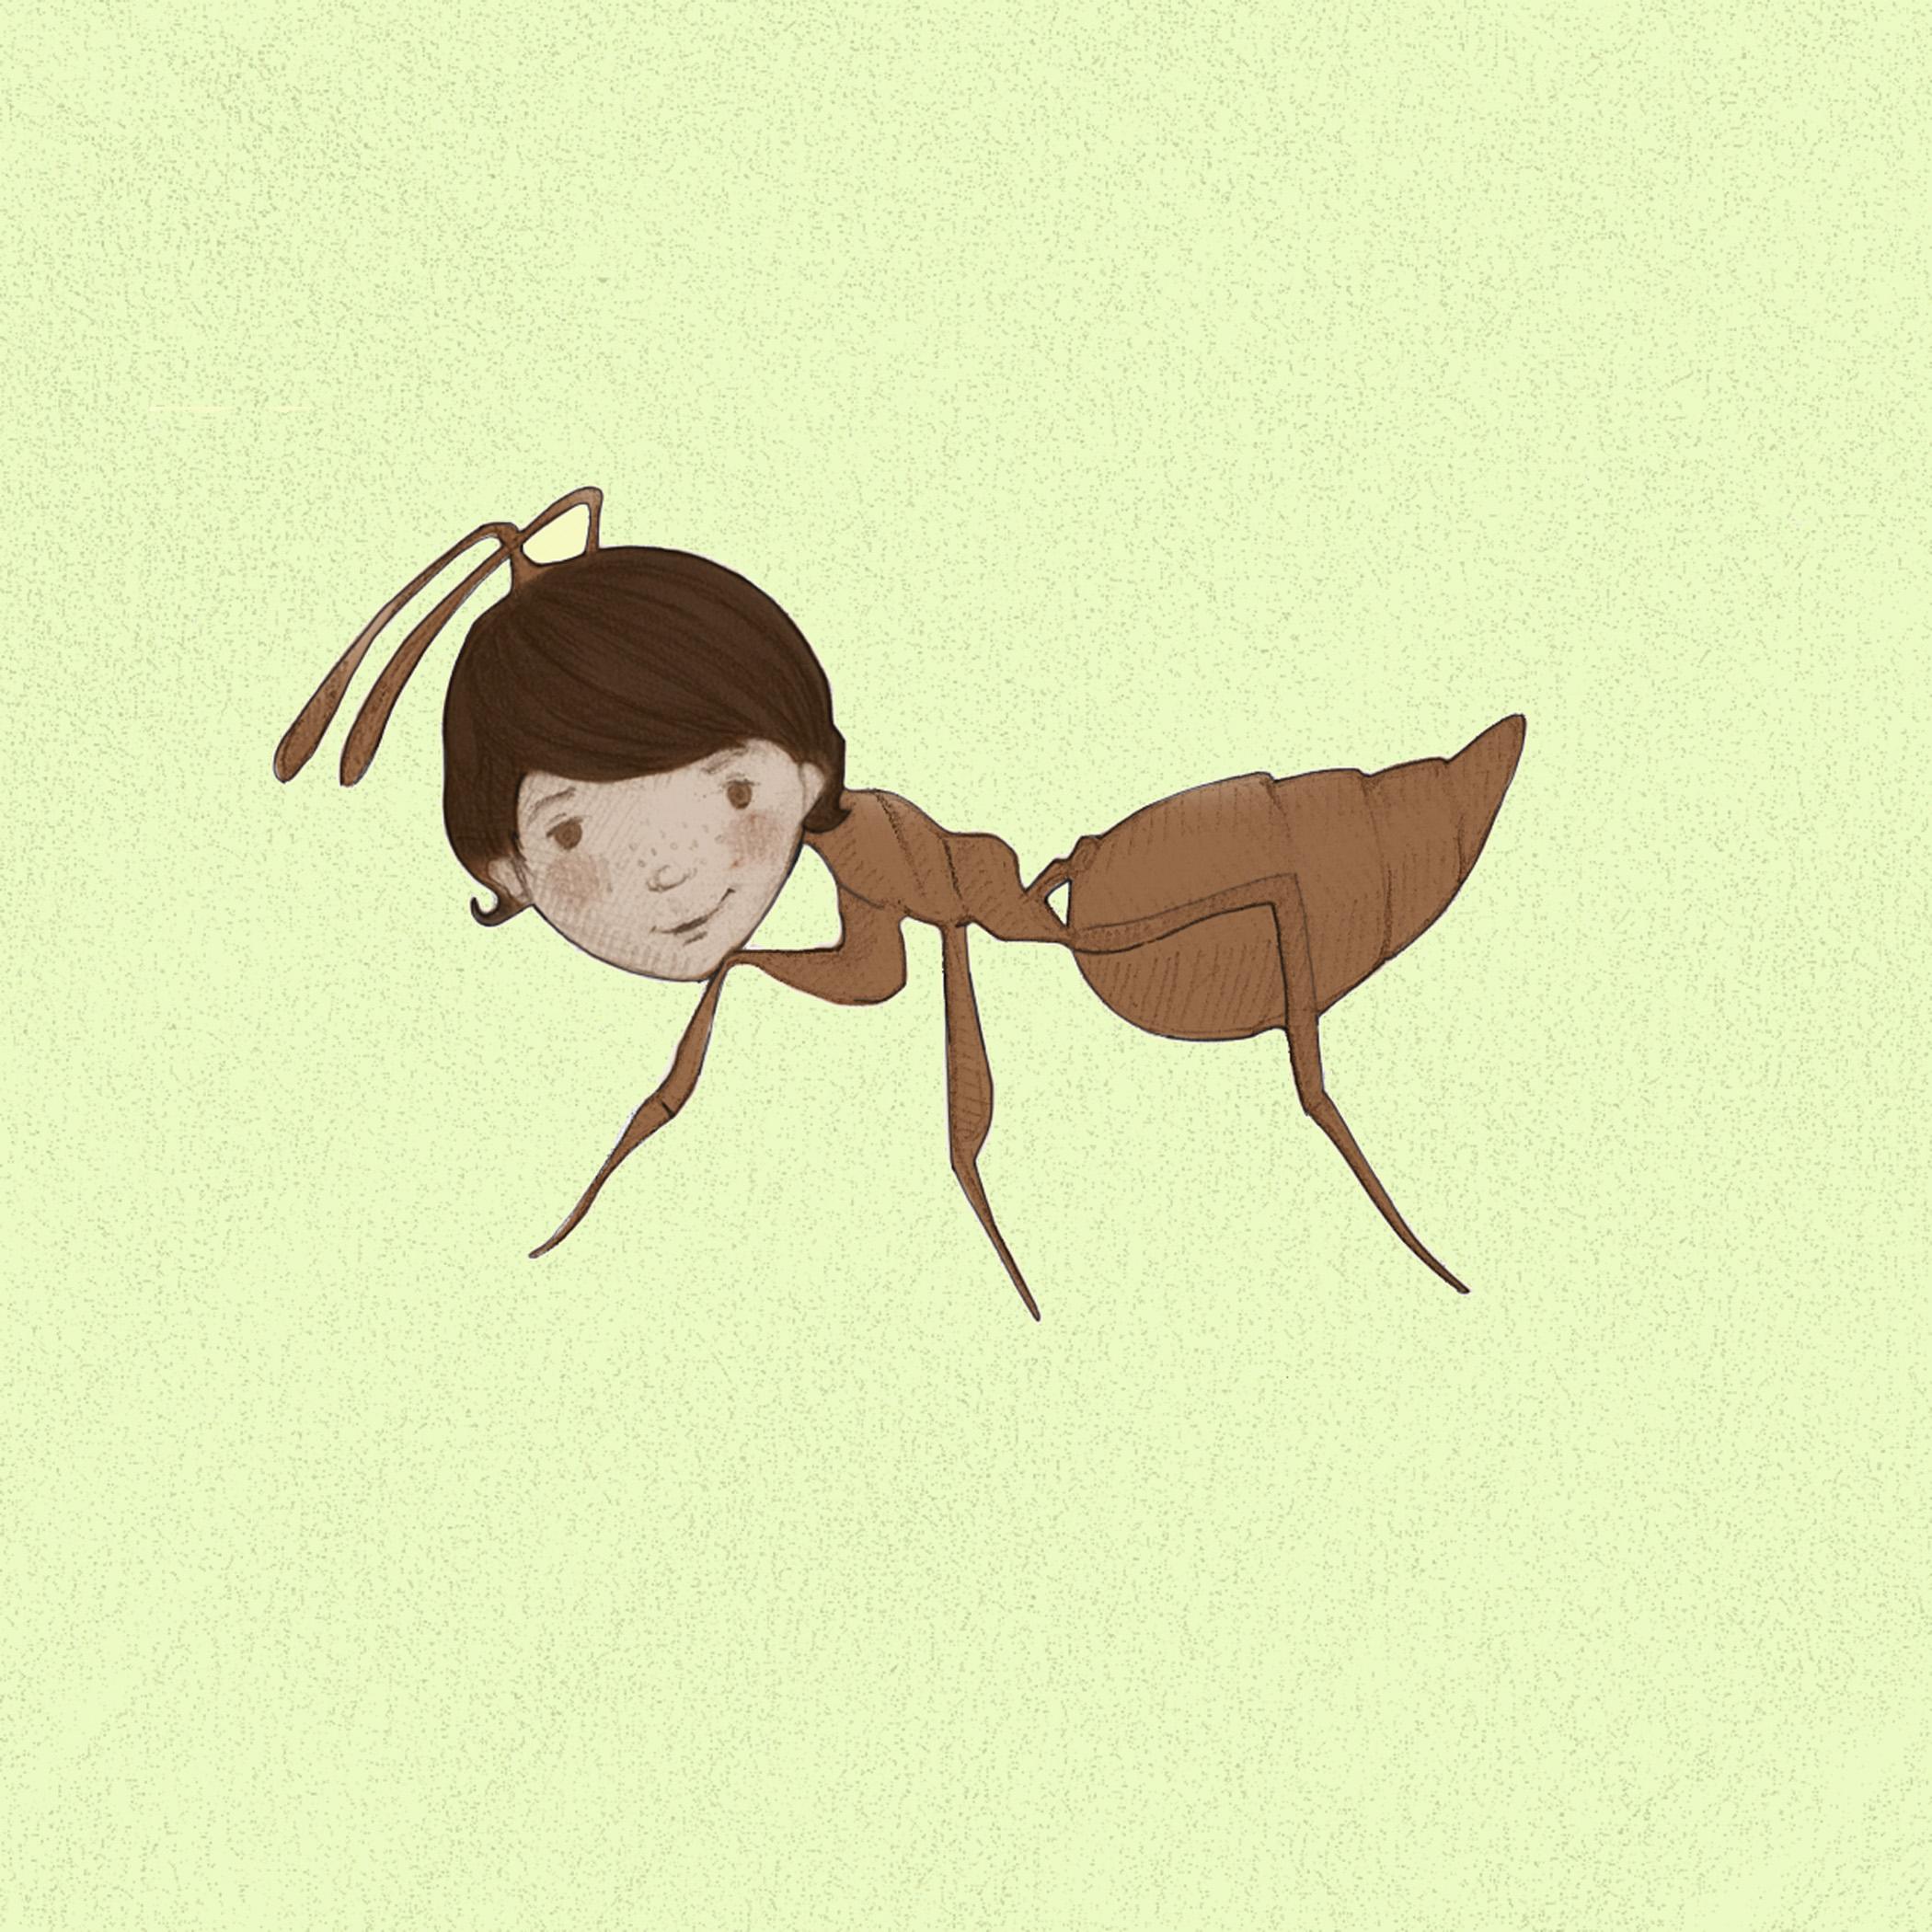 I am an ant